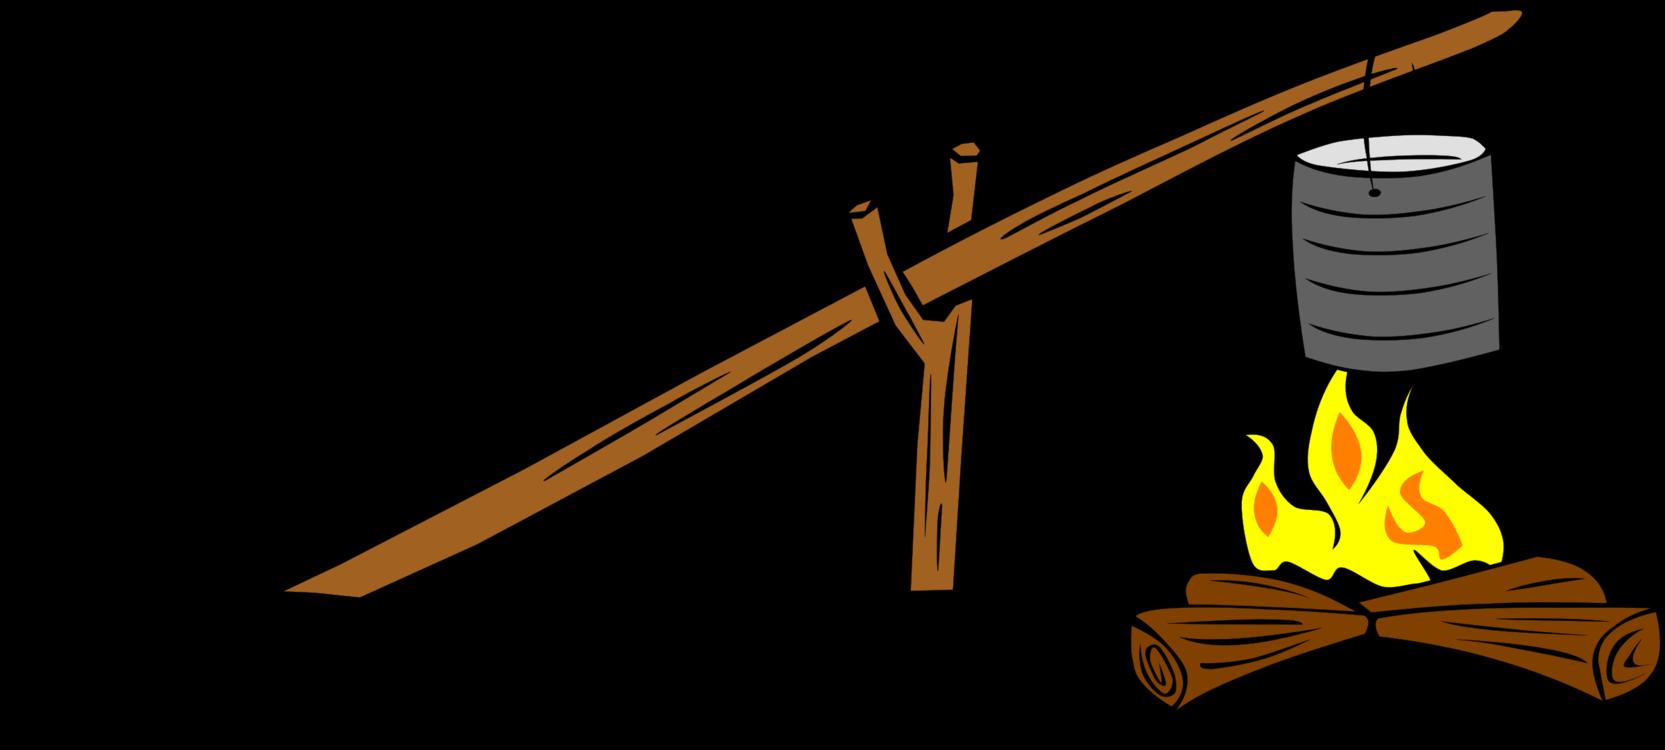 Artwork,Weapon,Beak